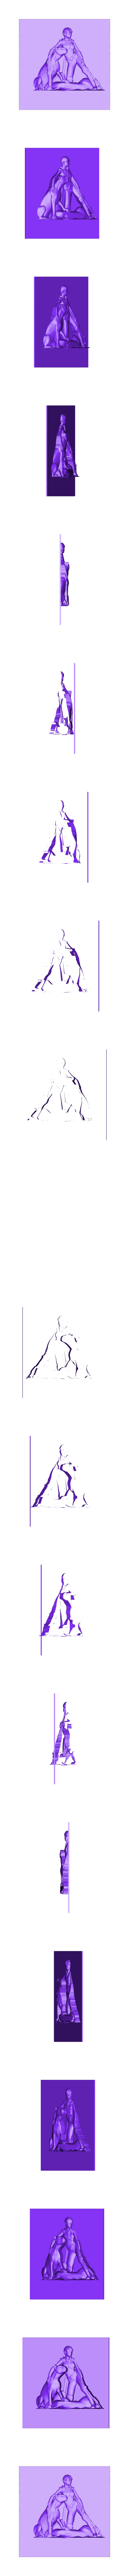 124.stl Download free STL file Hunter with a feline cnc art  • 3D print design, CNC_file_and_3D_Printing